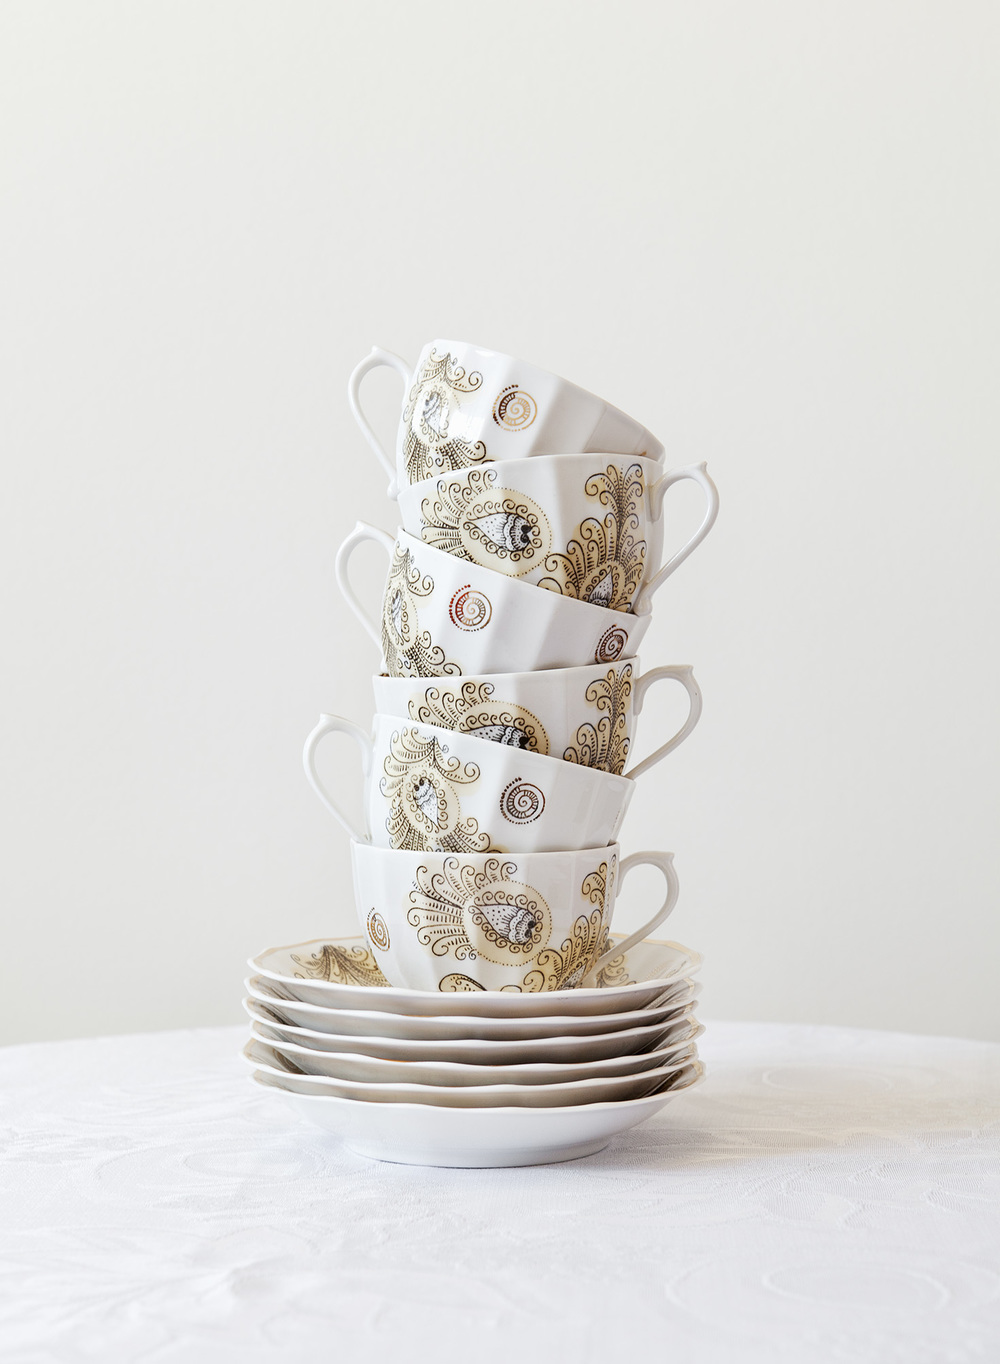 jenny rafalson_Russian porcelain4.jpg